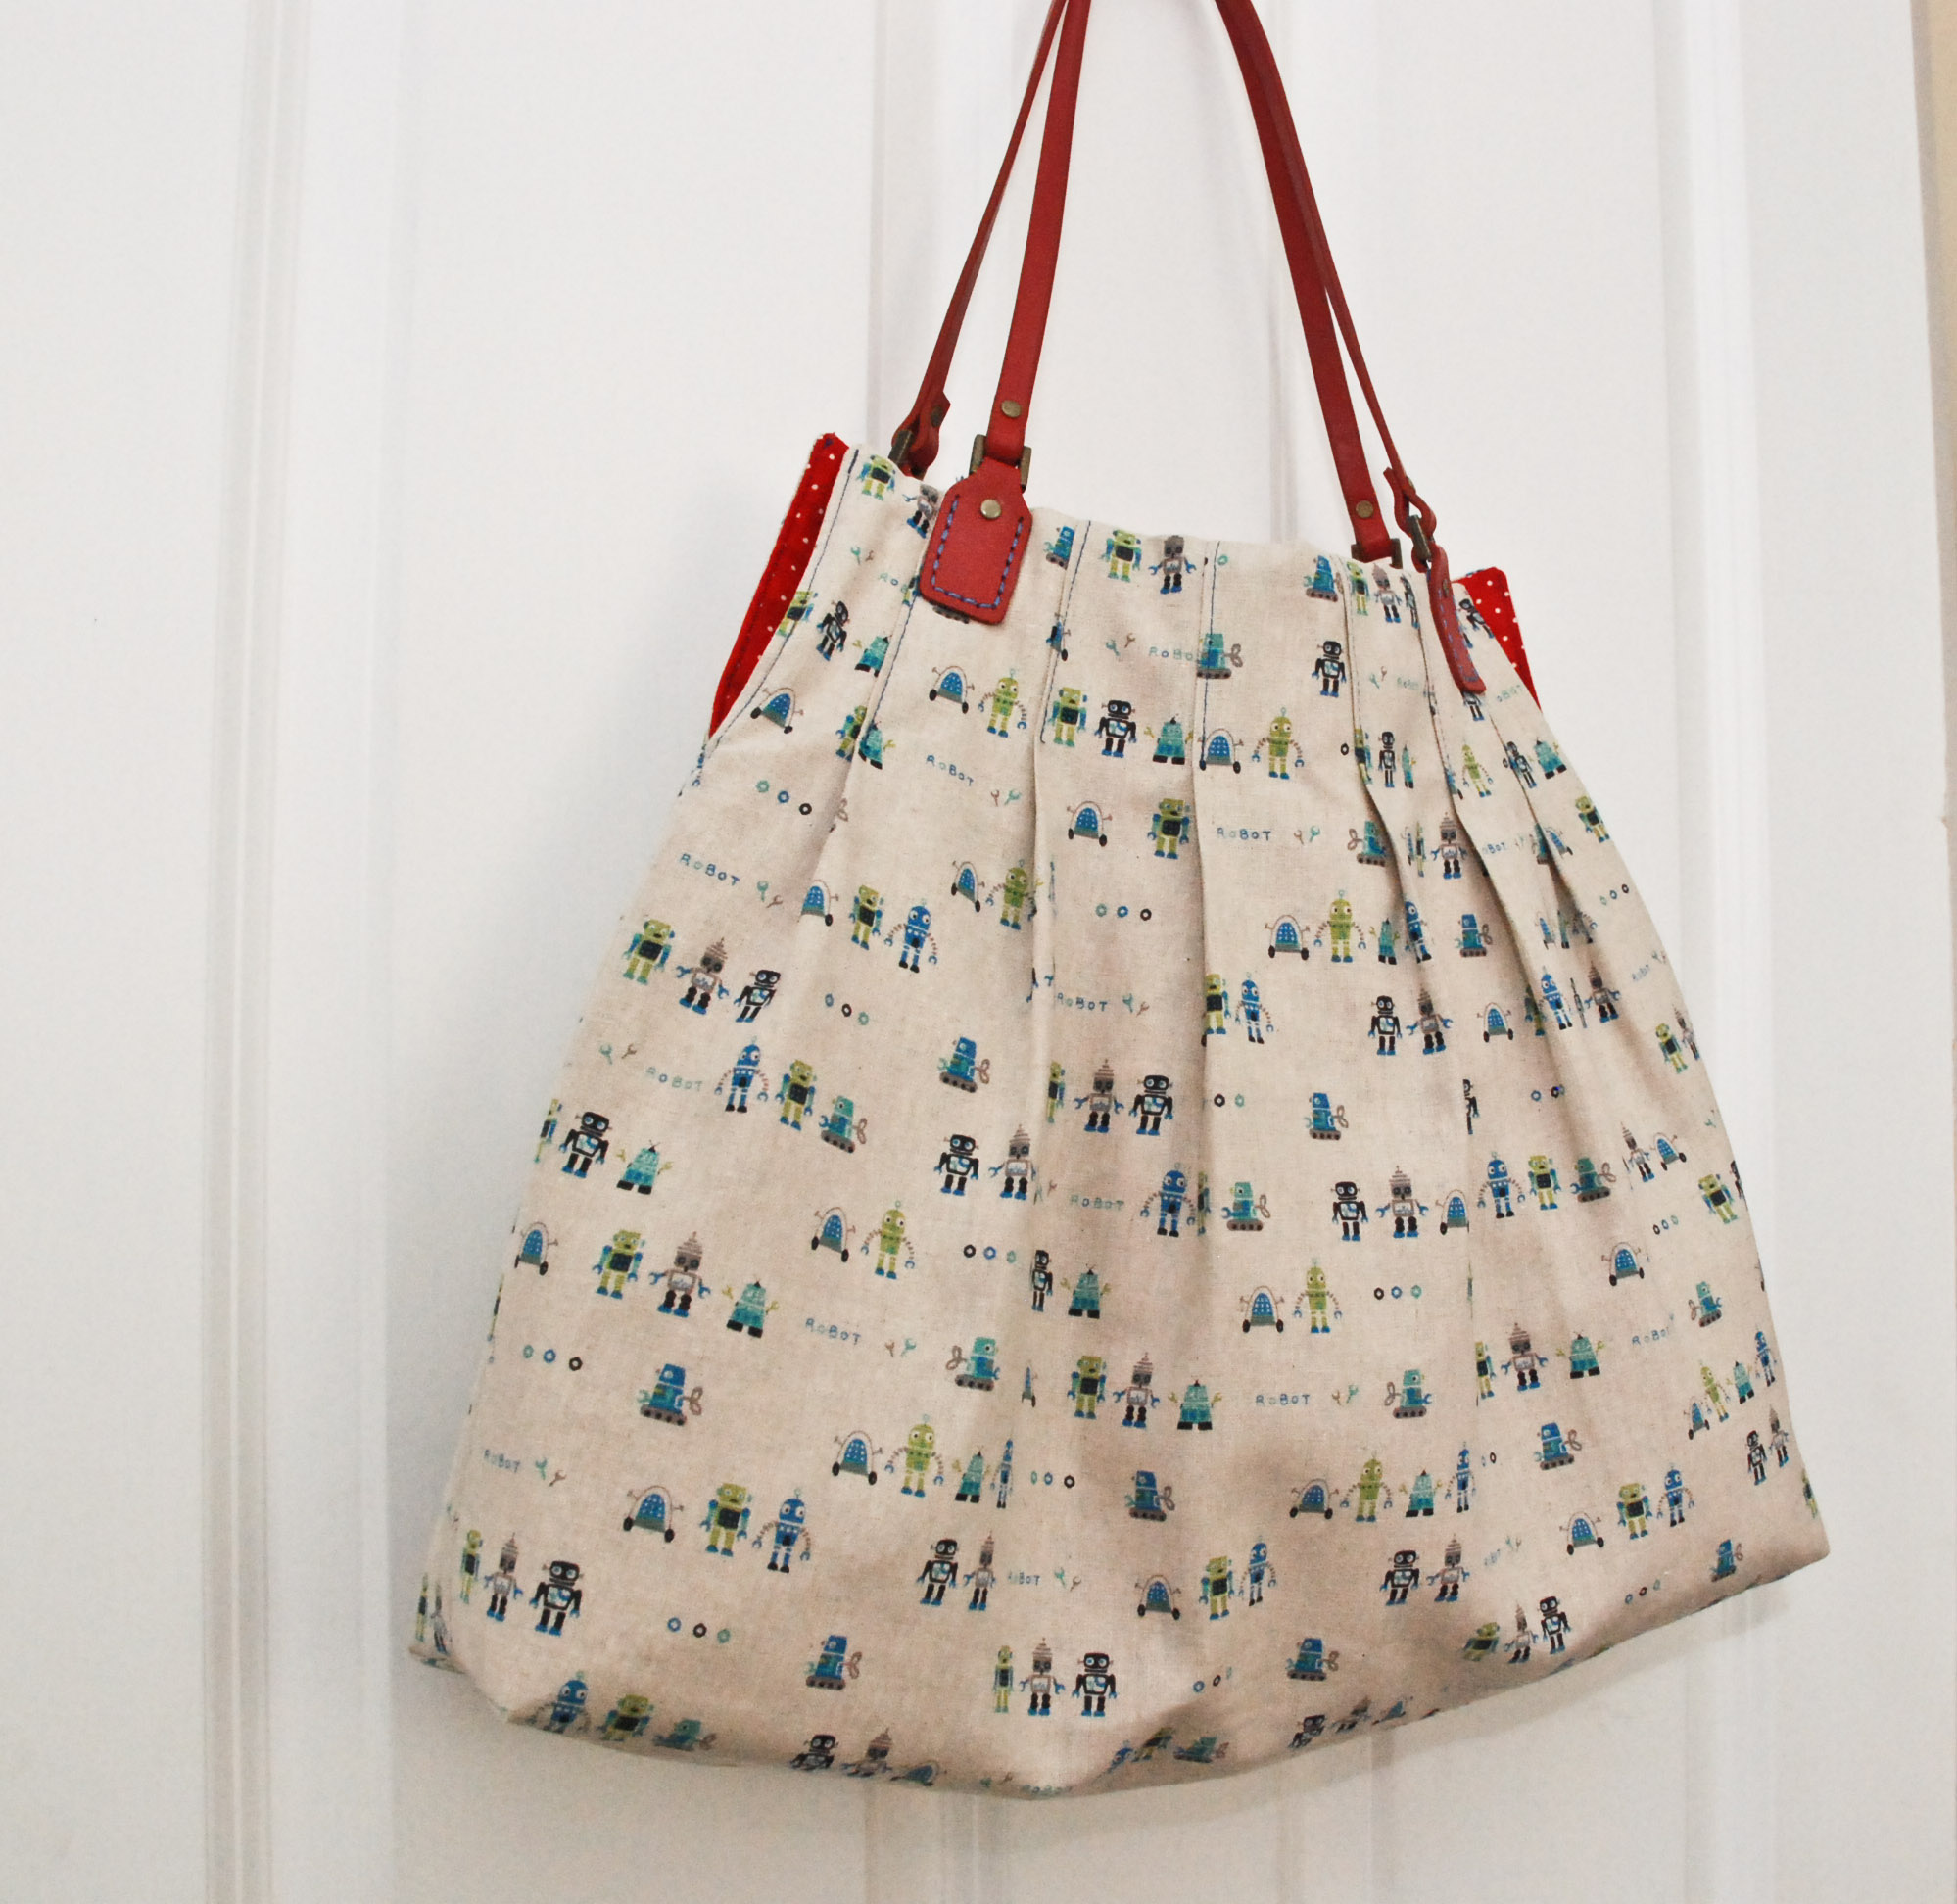 FREE bag purse pattern - \'For Pleat\'s Sake\' Tote - U-handblog